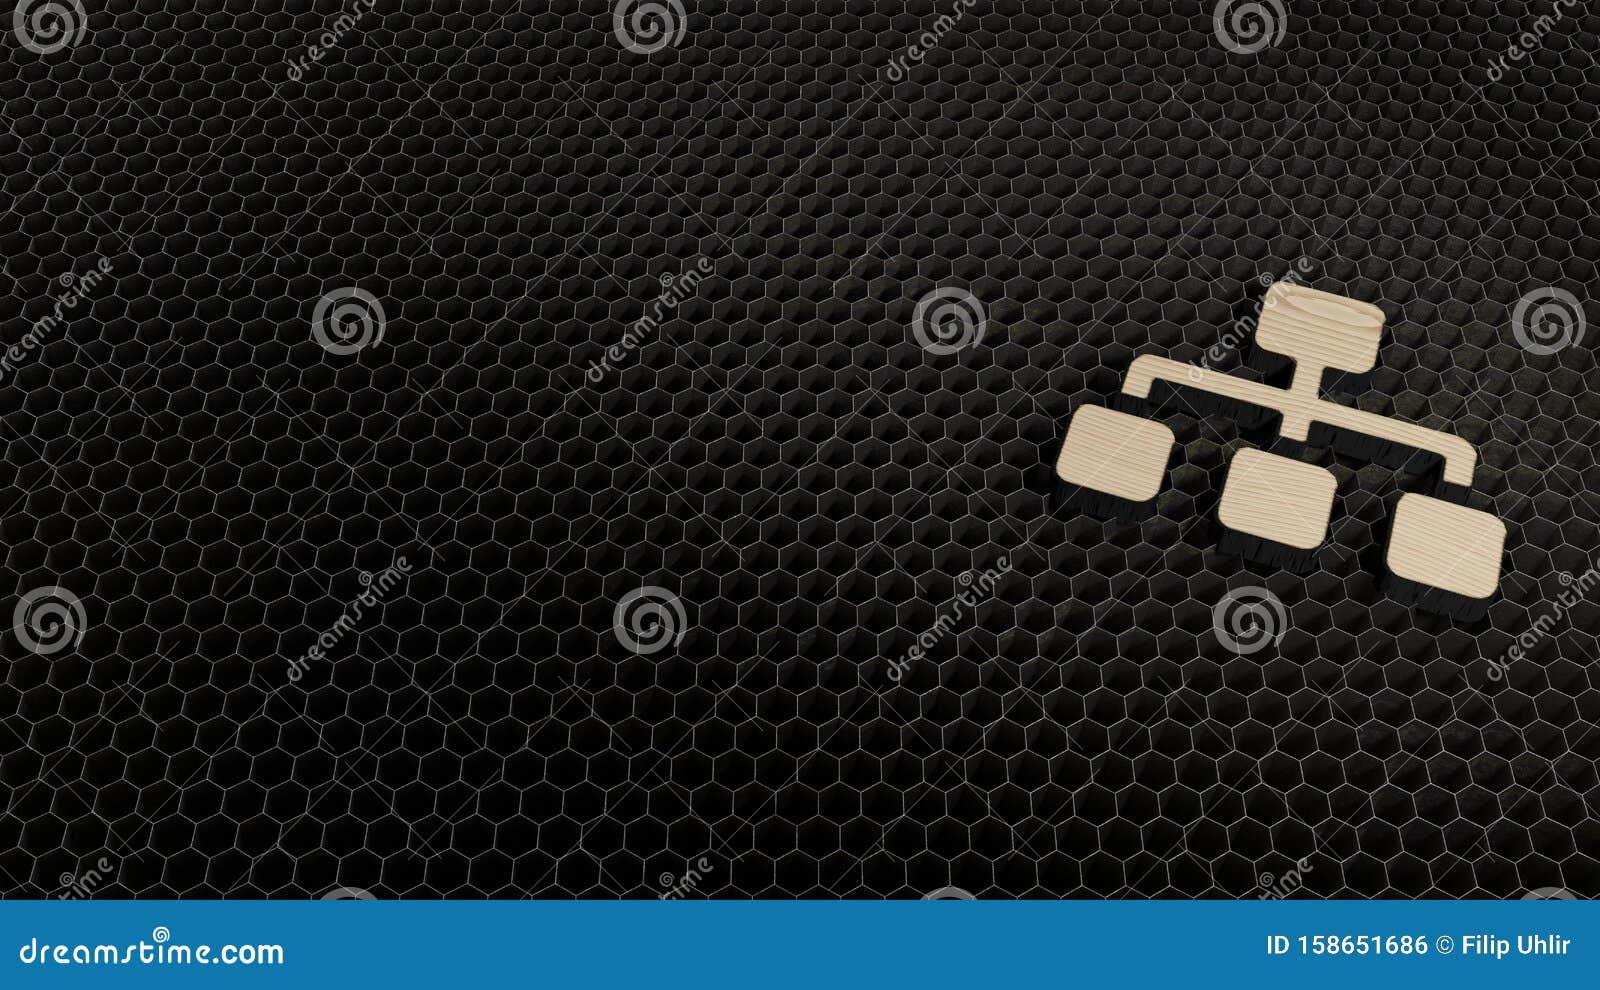 laser cut plywood symbol of sitemap